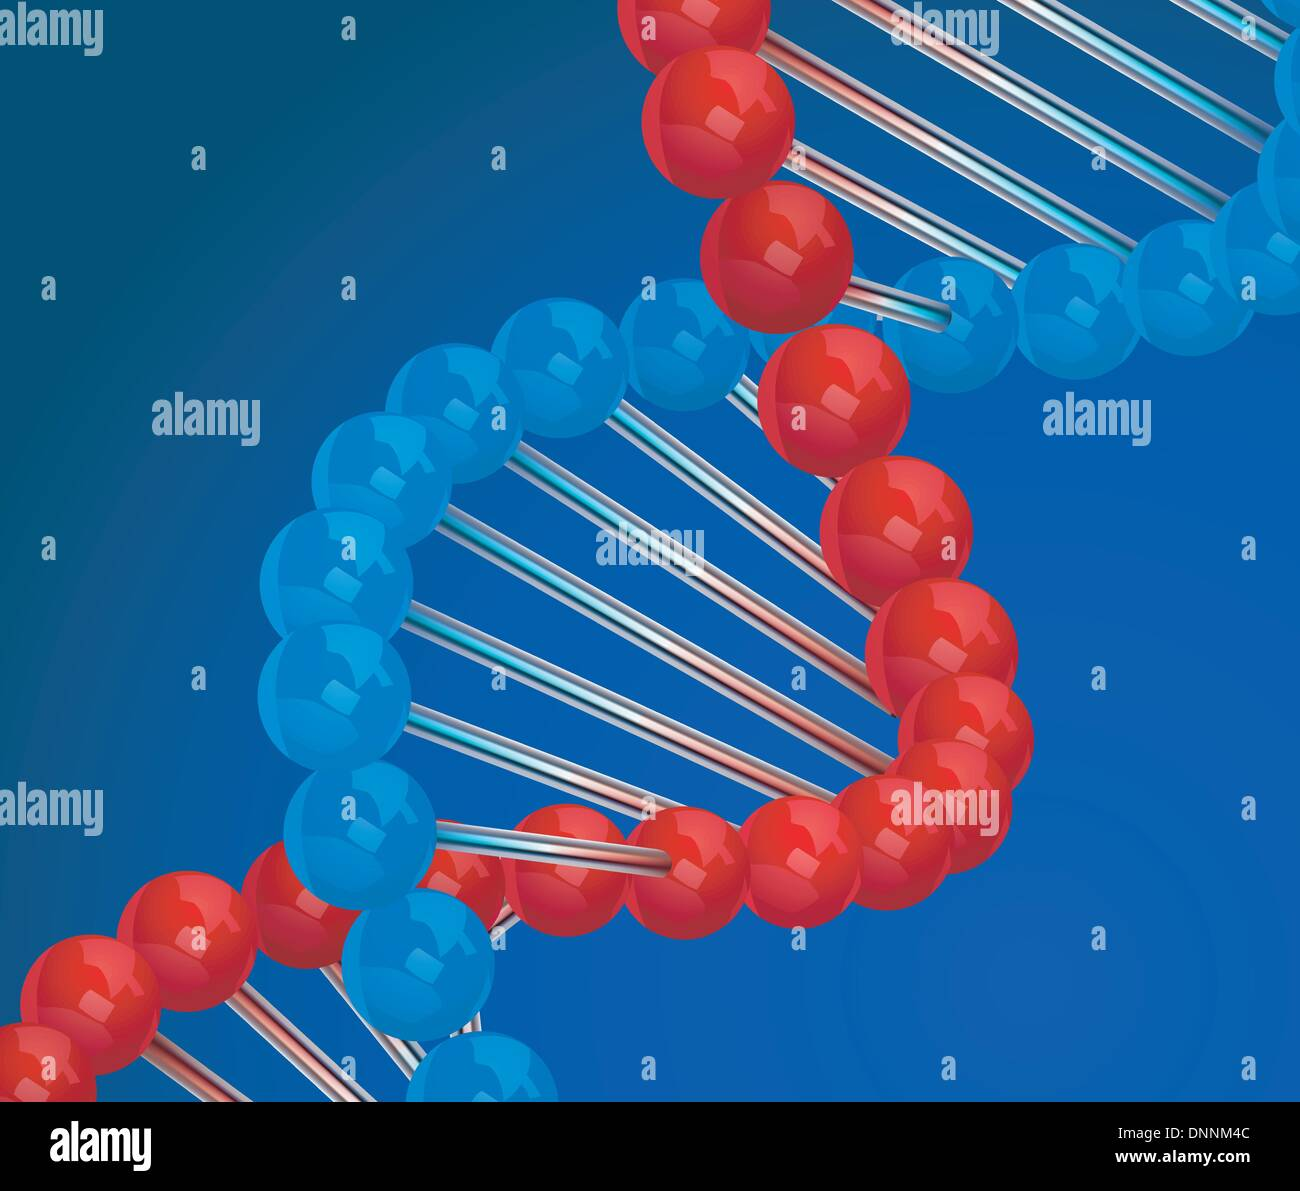 Dna 3d vector illustration on blue background - Stock Image